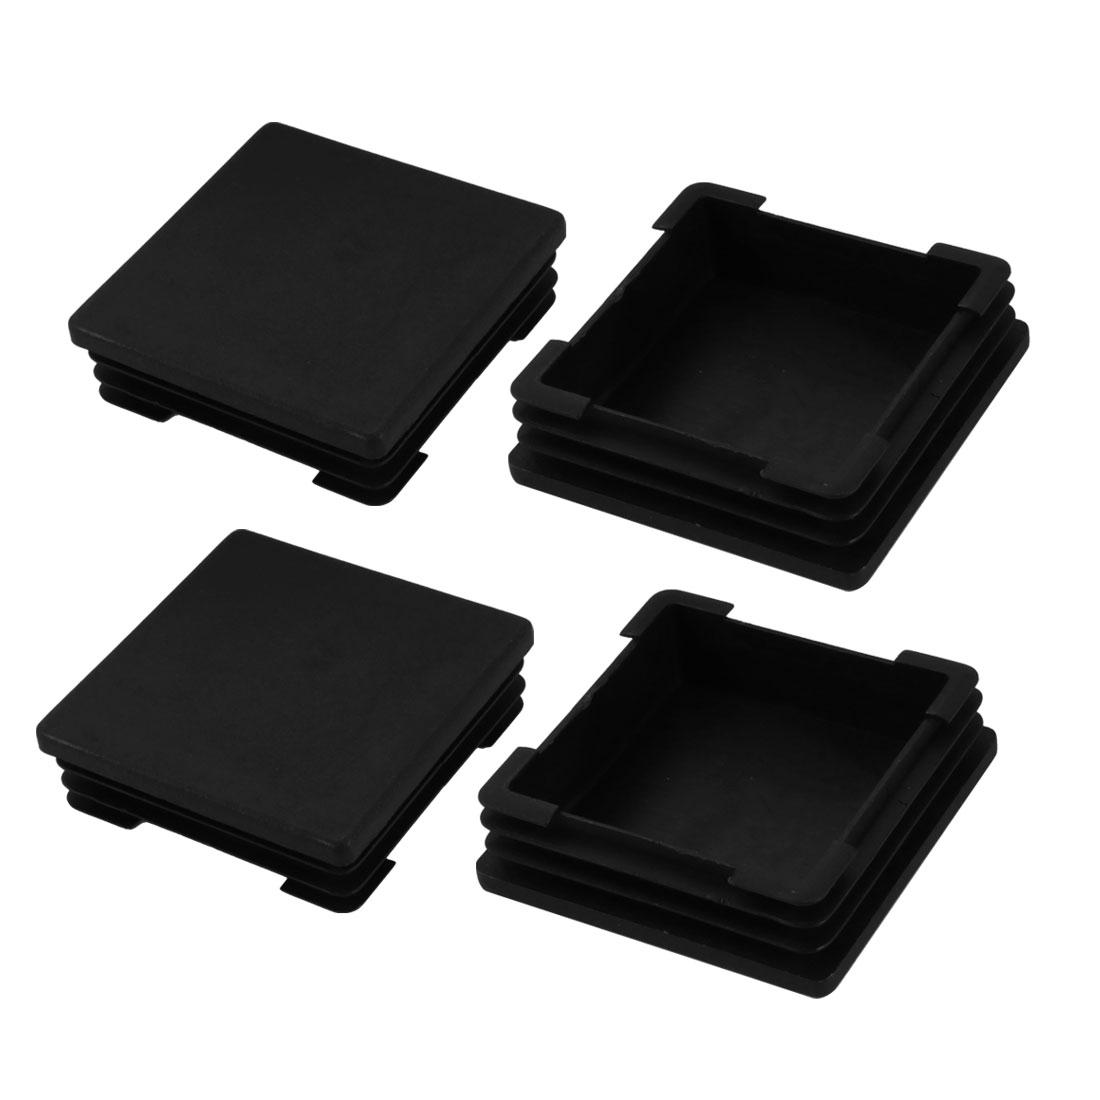 4pcs 70mm X 70mm Pipe Tube Insert Chair Leg Cap Square Black Plastic Tubing Plug